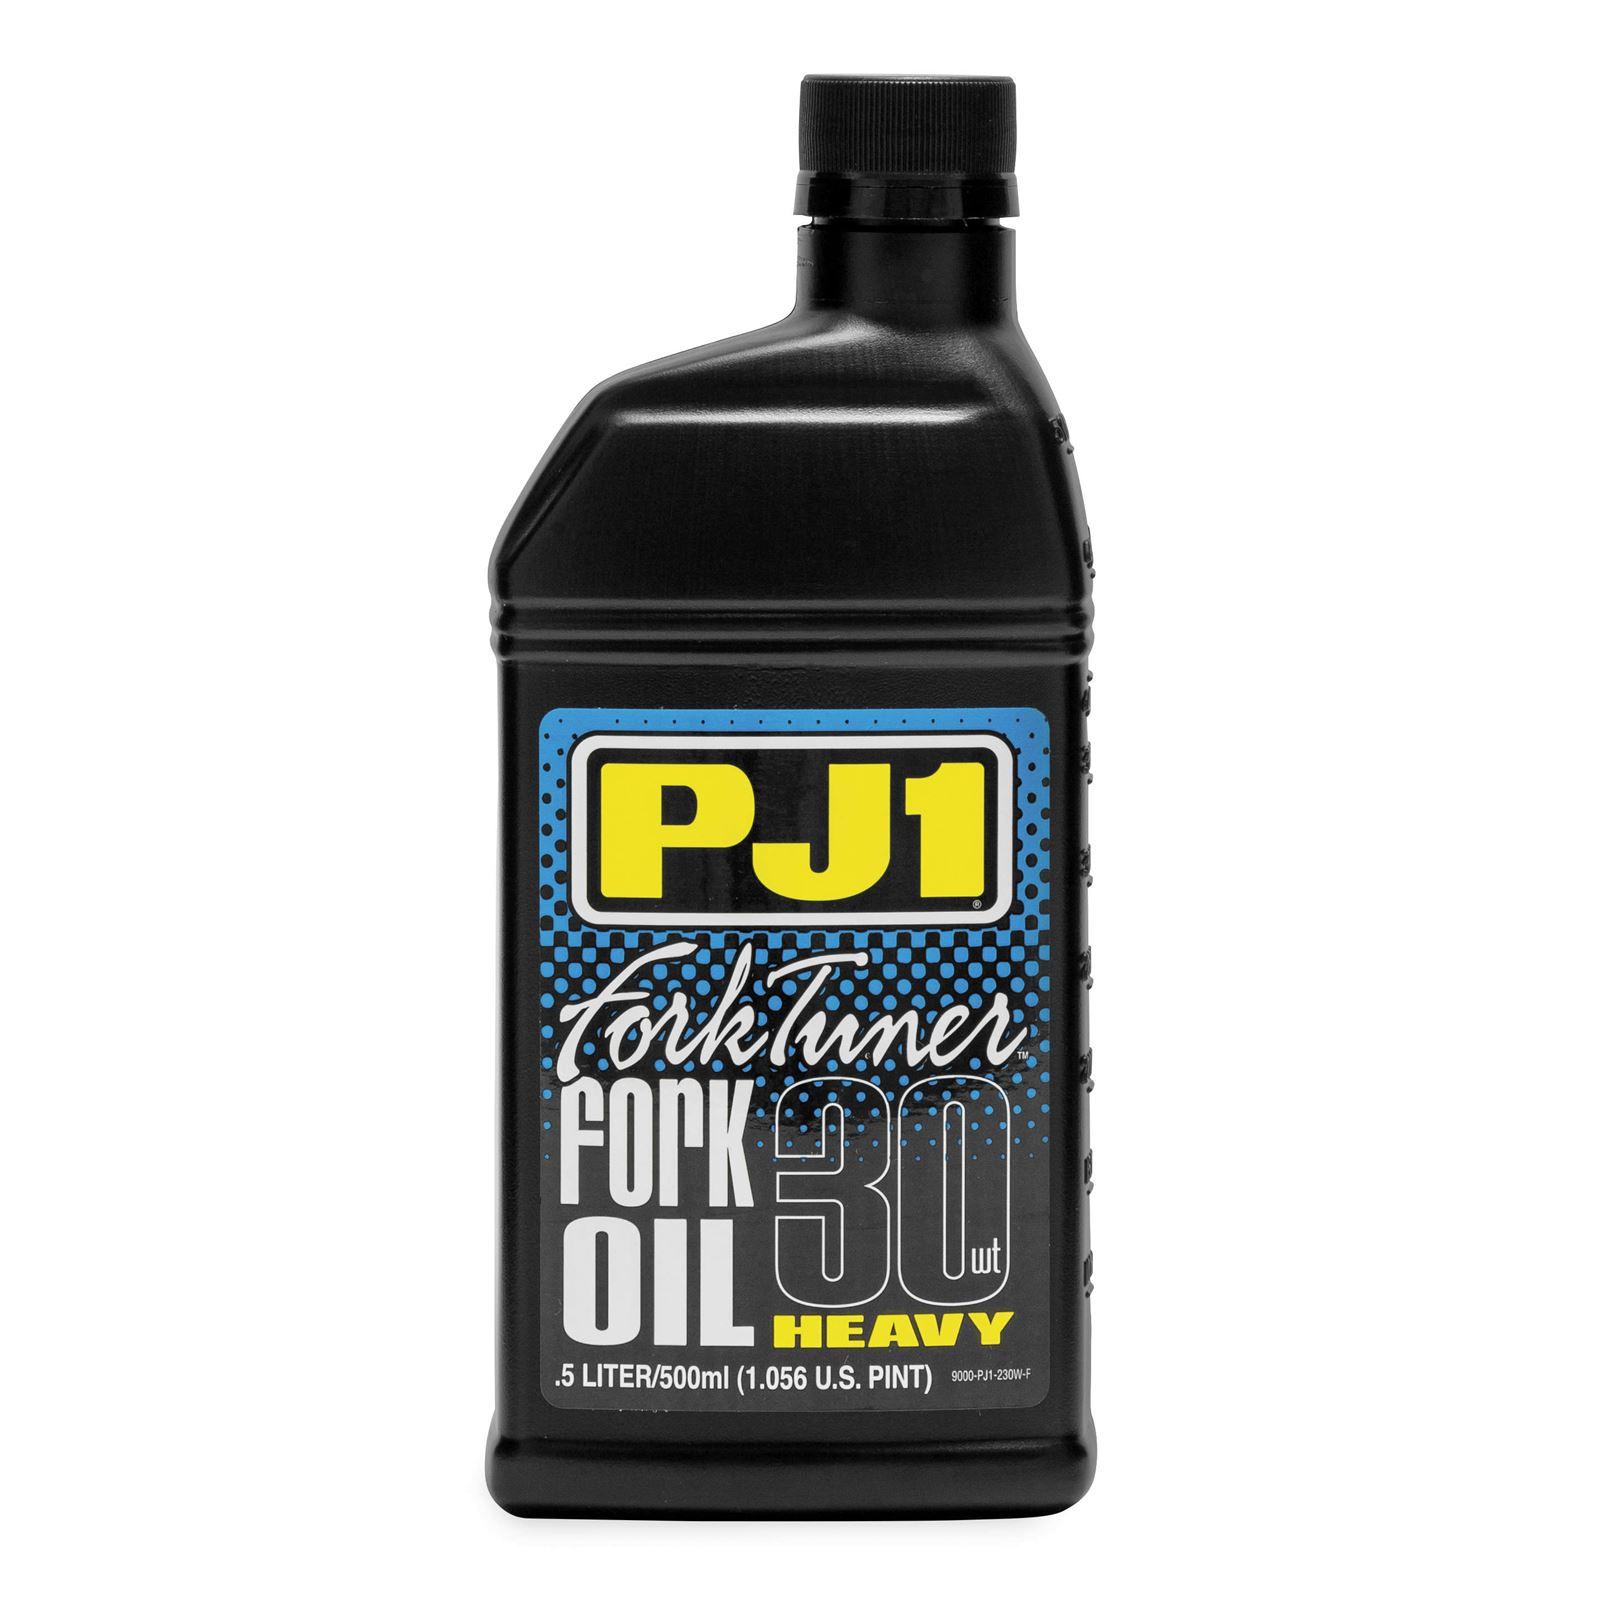 PJ1 Competition Fork Oil